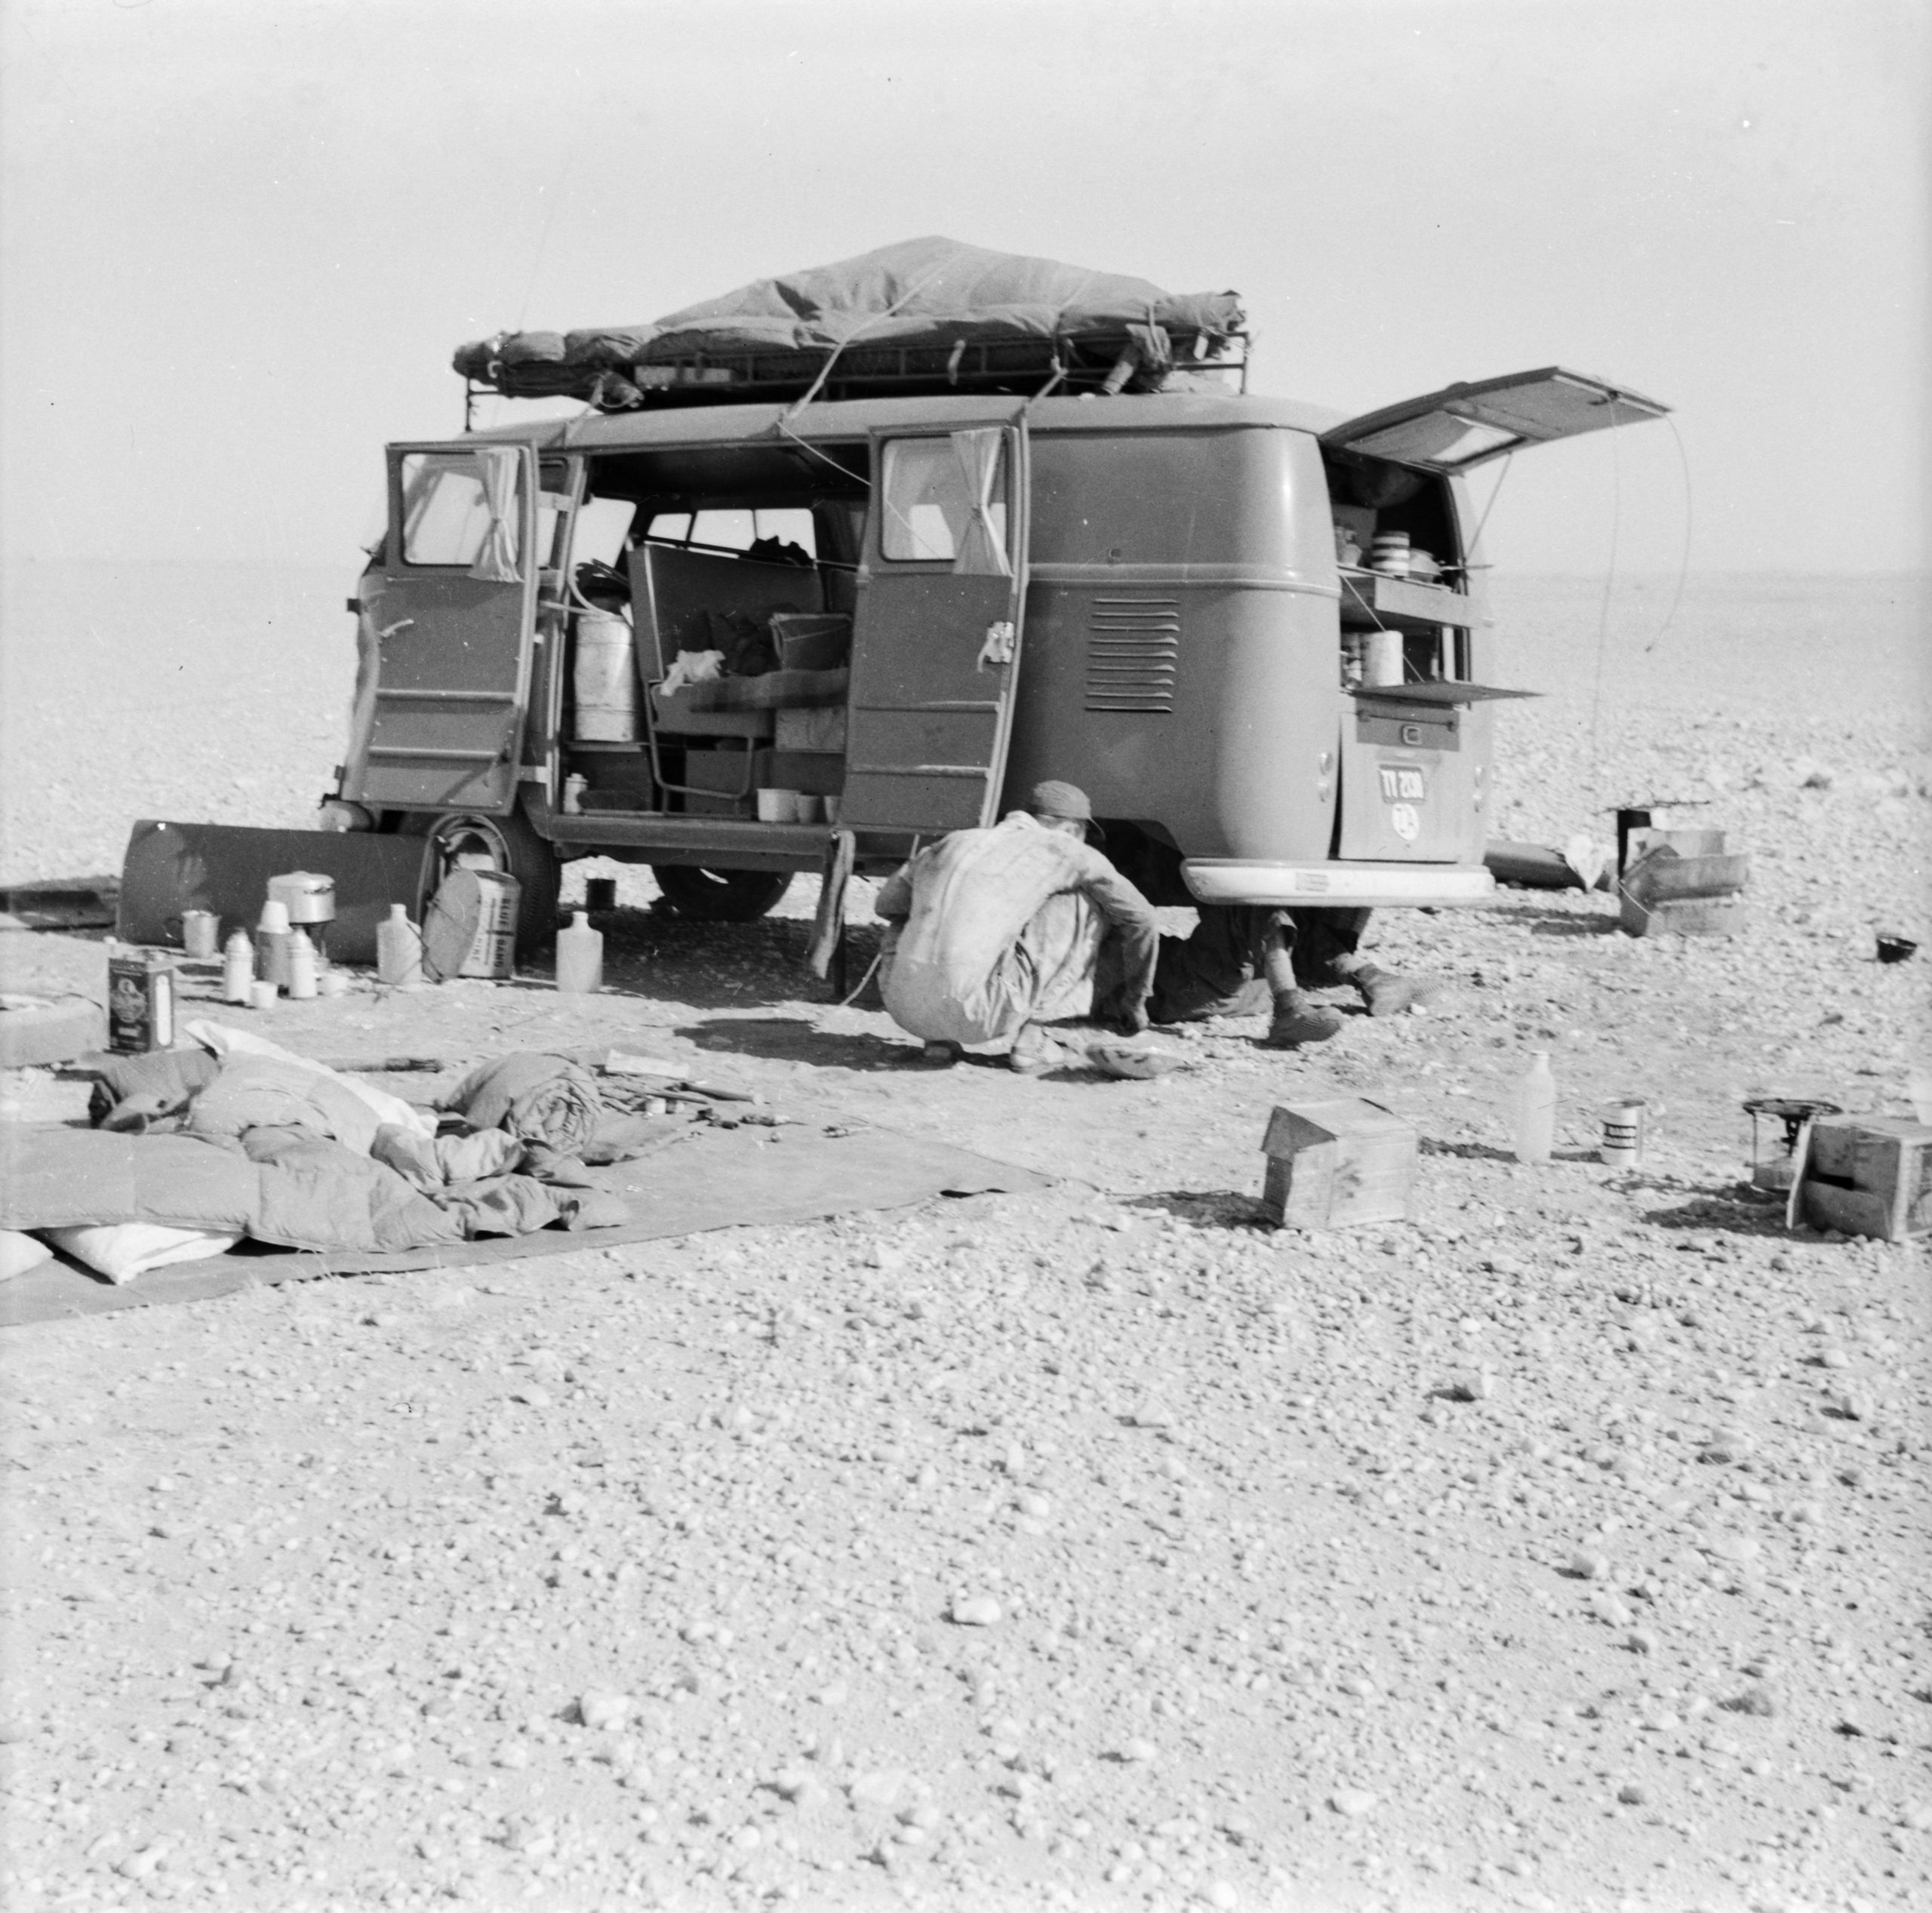 Home is a Journey - Feb 25 Desert car repairs